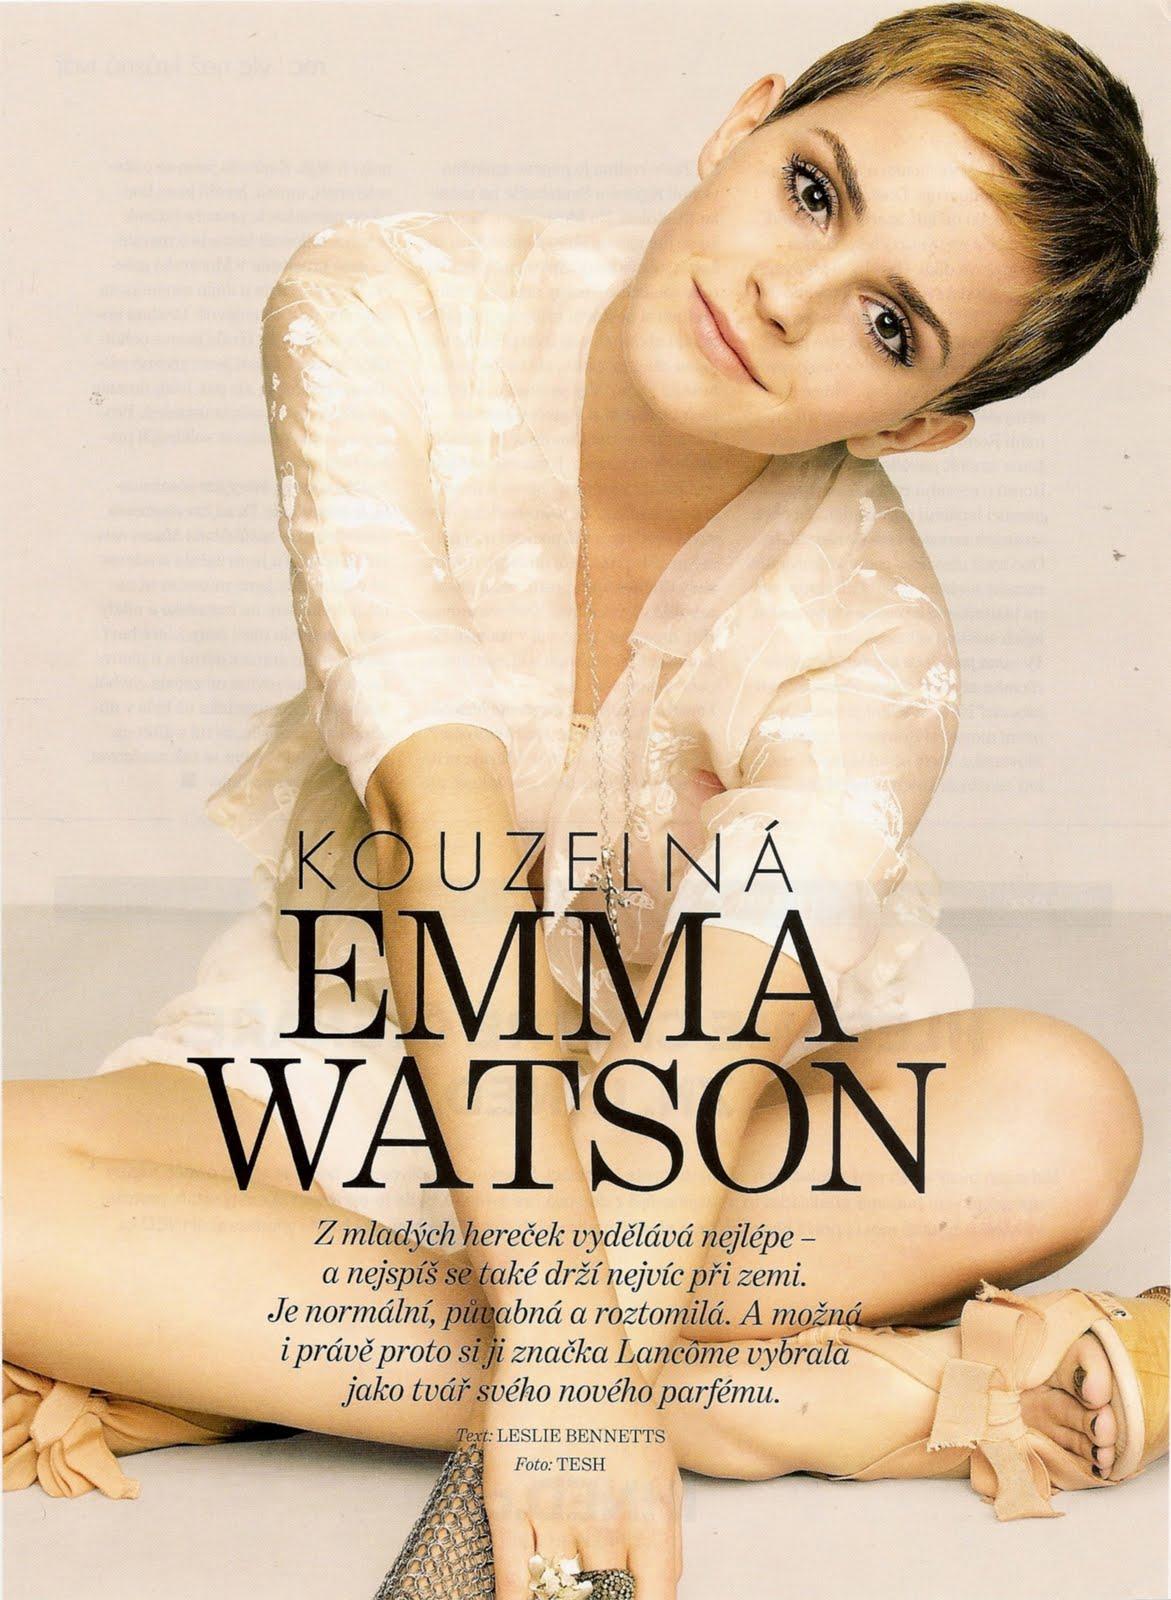 http://3.bp.blogspot.com/-ZL7nUHSS0ec/Tgnj3Uwtc_I/AAAAAAAAKII/YJlWqhVXtVY/s1600/Emma+Watson+Marie+Claire+%2528CZ%2529+Magazine+July+2011+%25282%2529.jpg